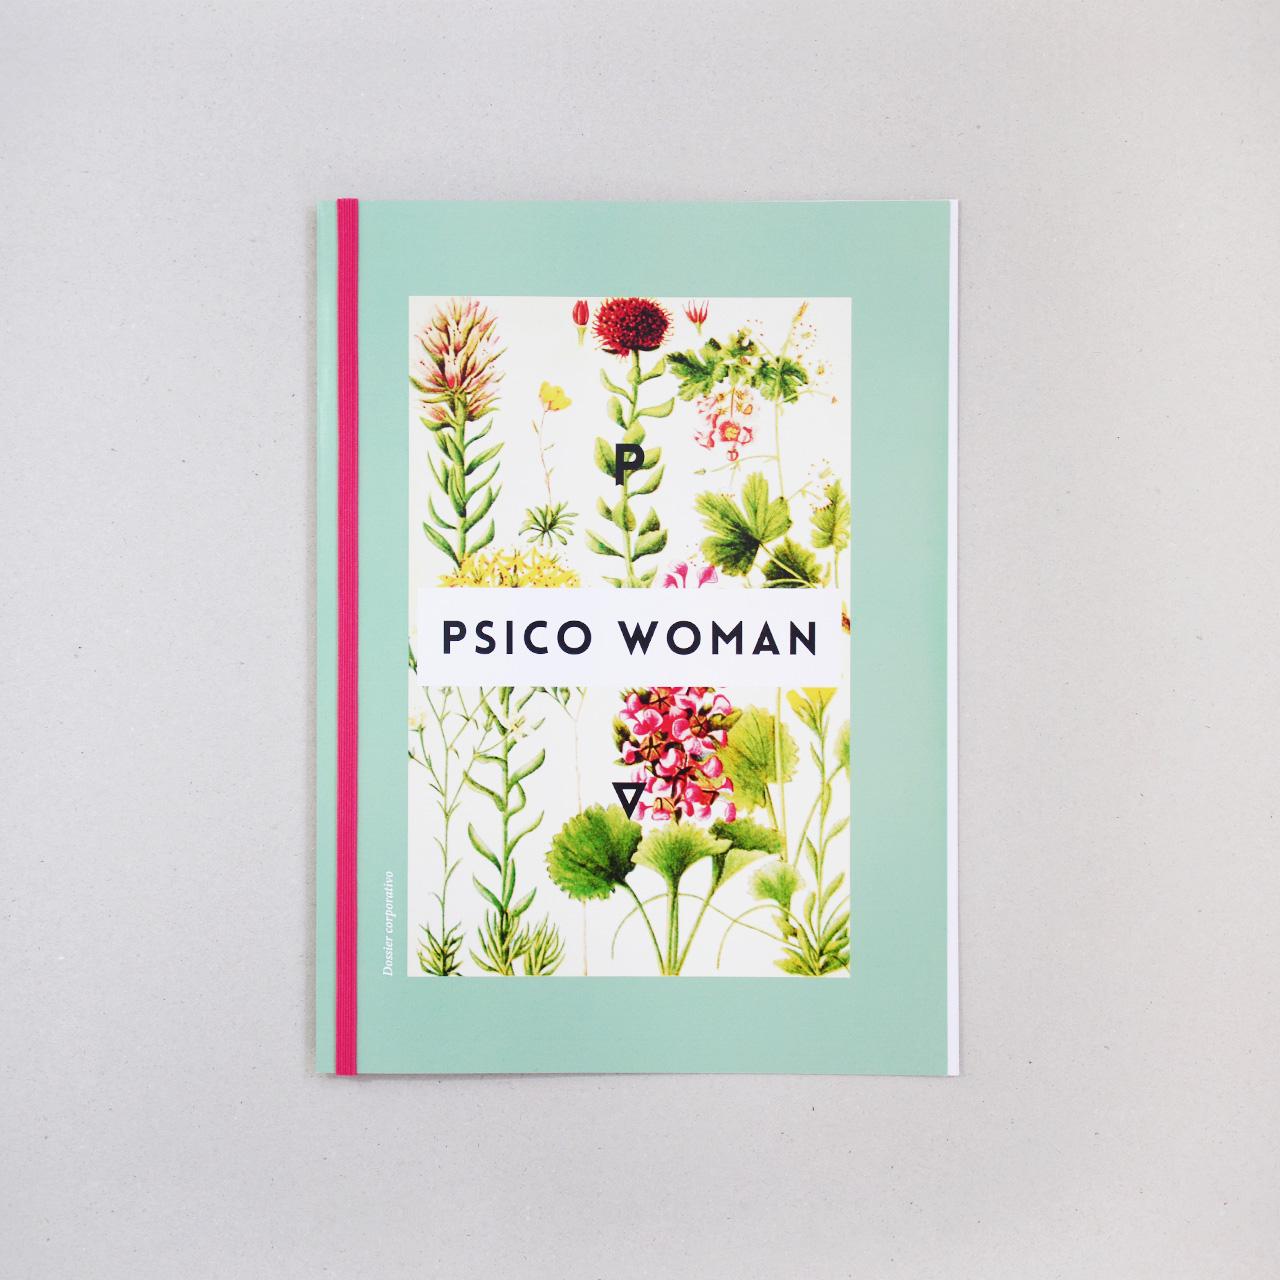 disenoconperspectiva-portada-psicowoman-destacada